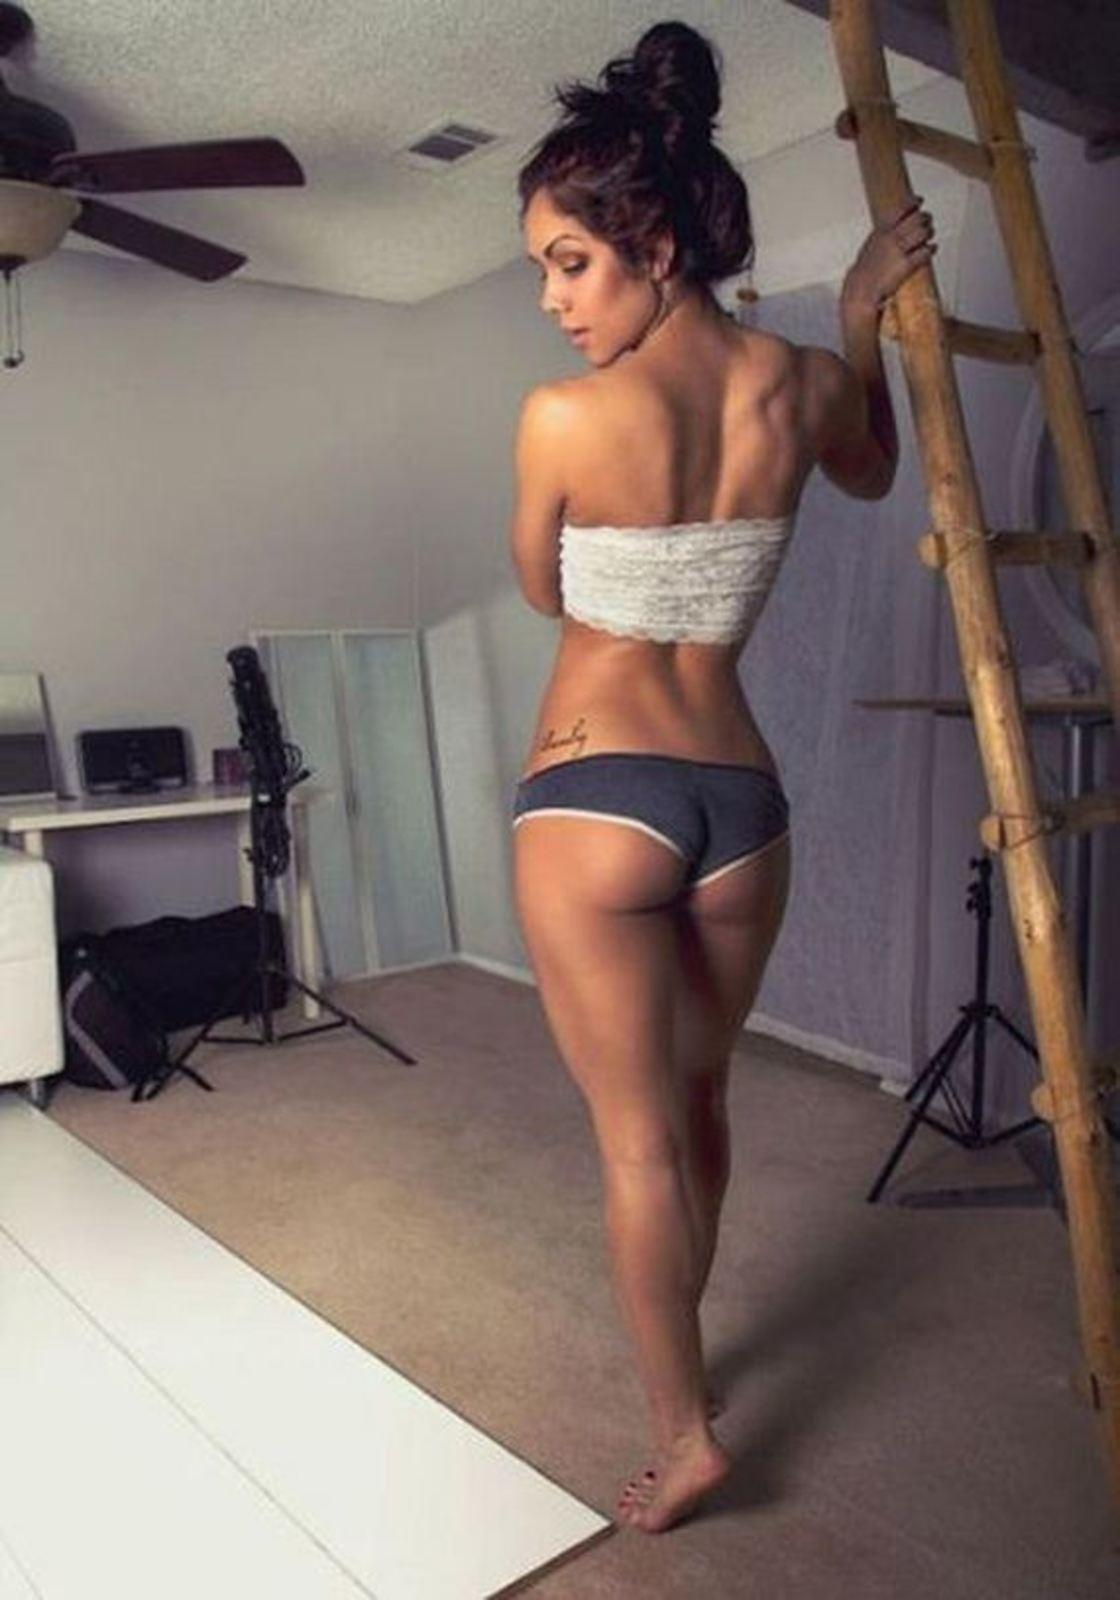 Sporty ebony babe Jade Nacole showcasing her petite curves outdoor  1495135